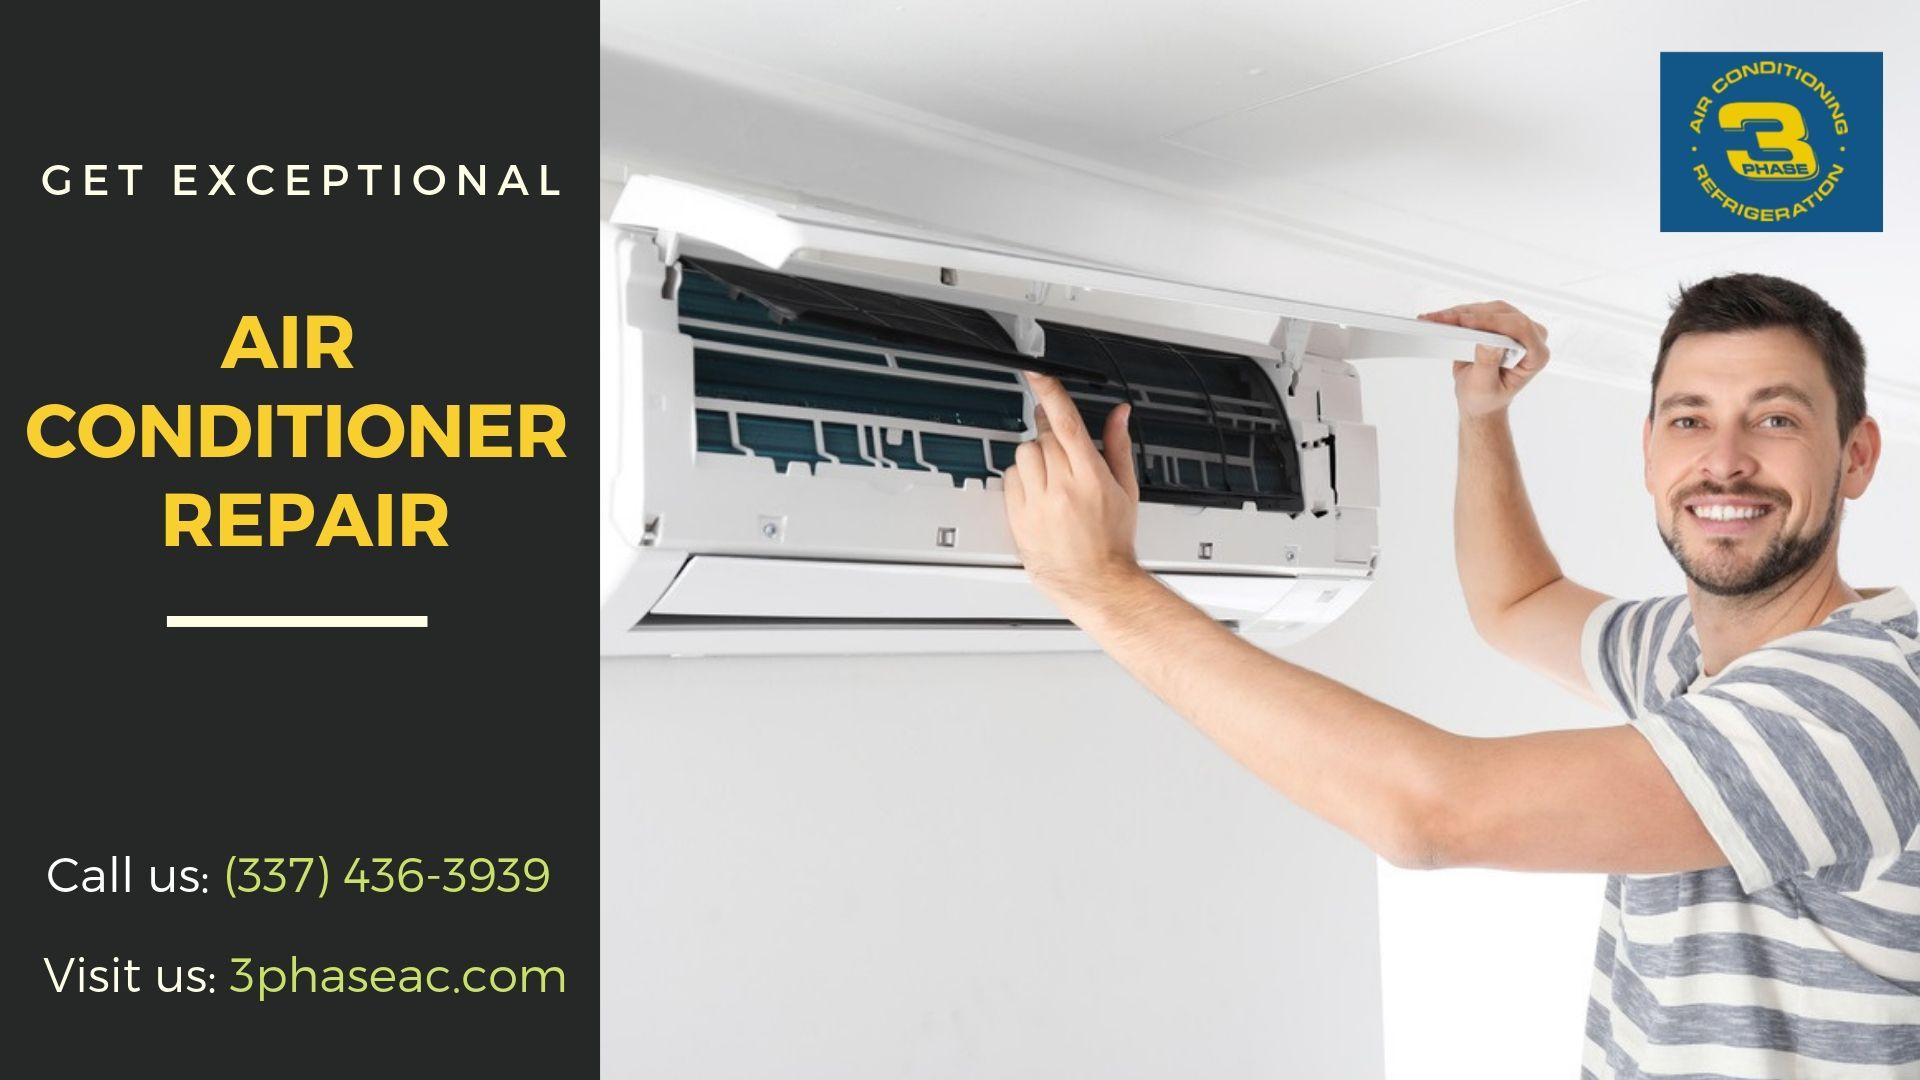 Get Exceptional Air Conditioner Repair Service Air Conditioner